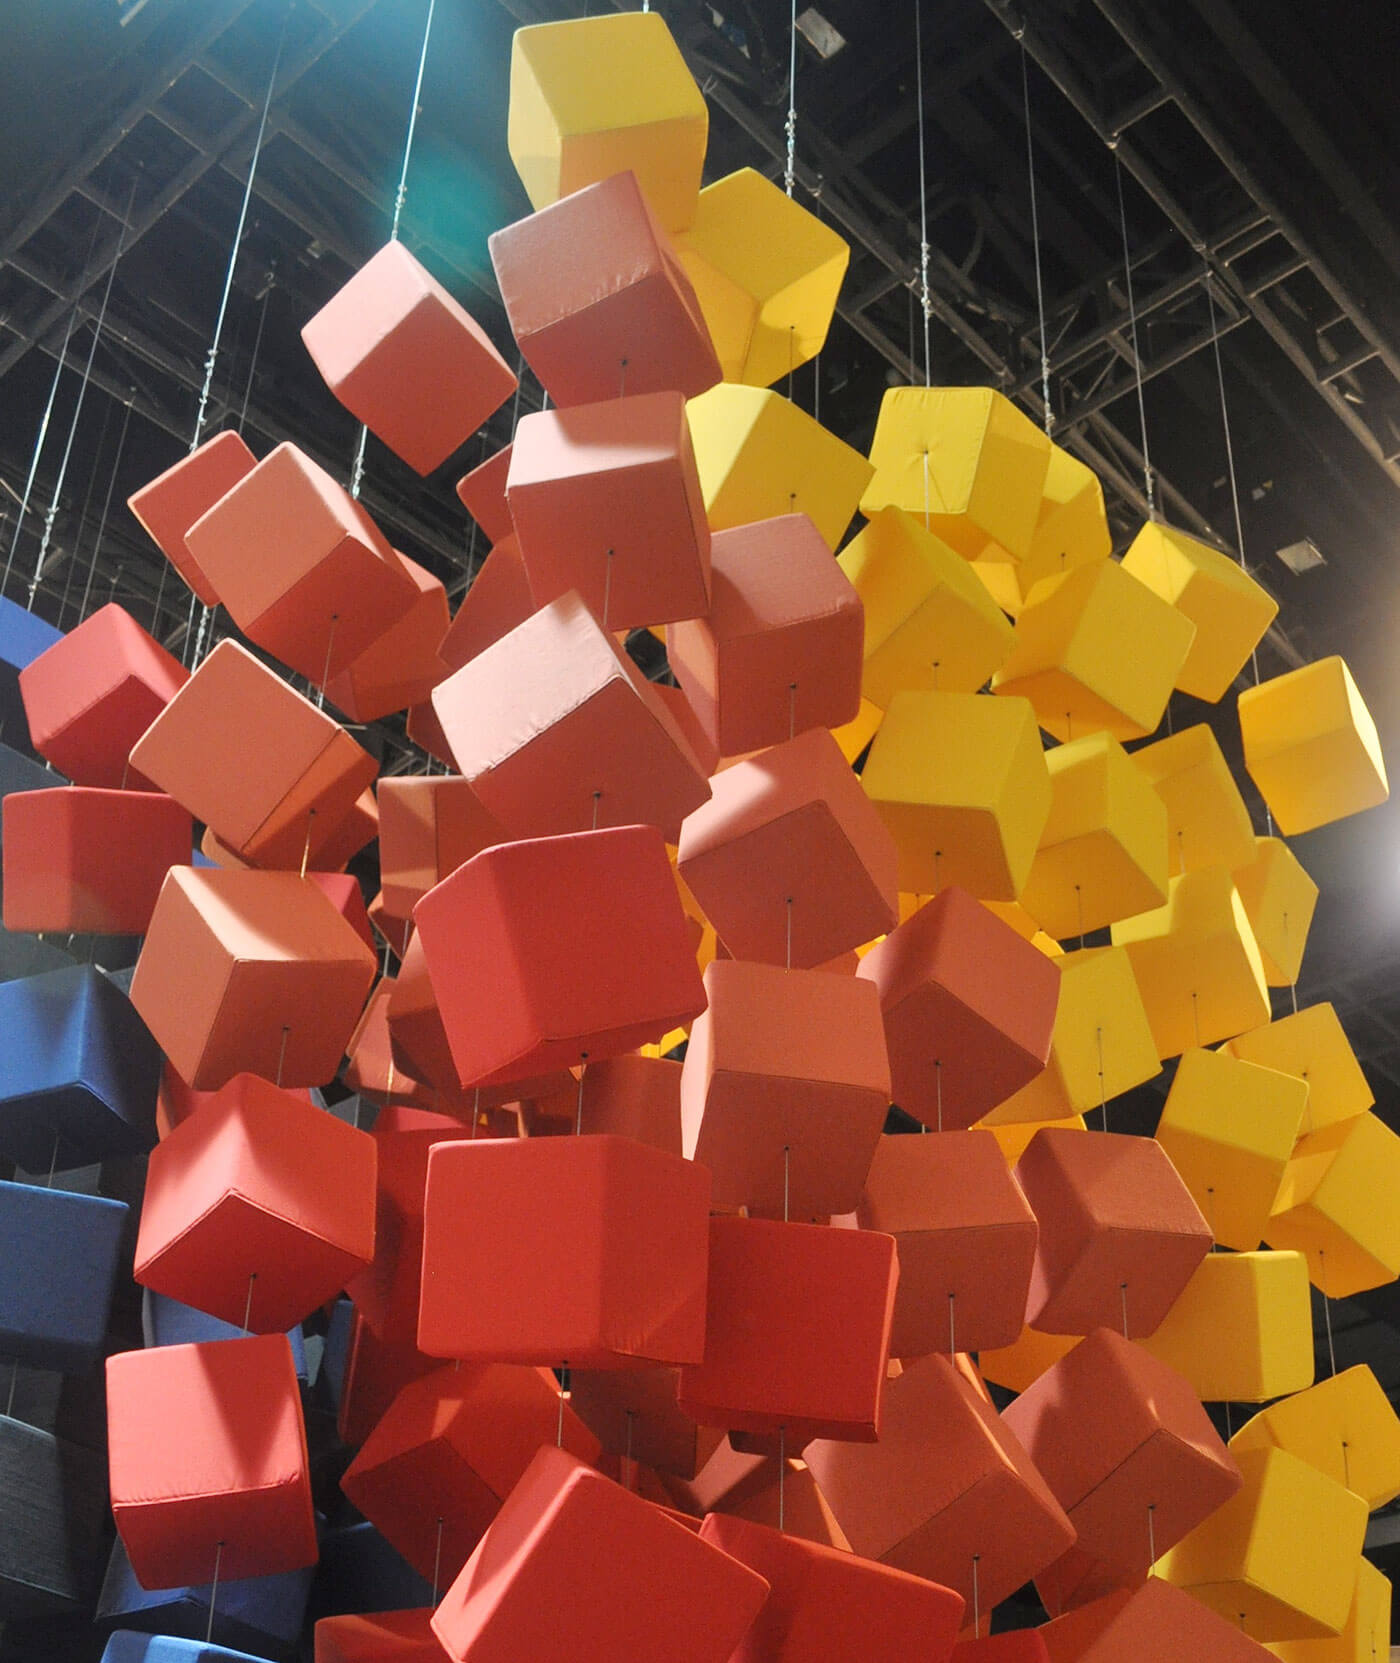 Sunbrella Spectrum 的特色是使用了颜色亮丽、悬浮于装饰立方体上方的 Sunbrella 装饰布料。